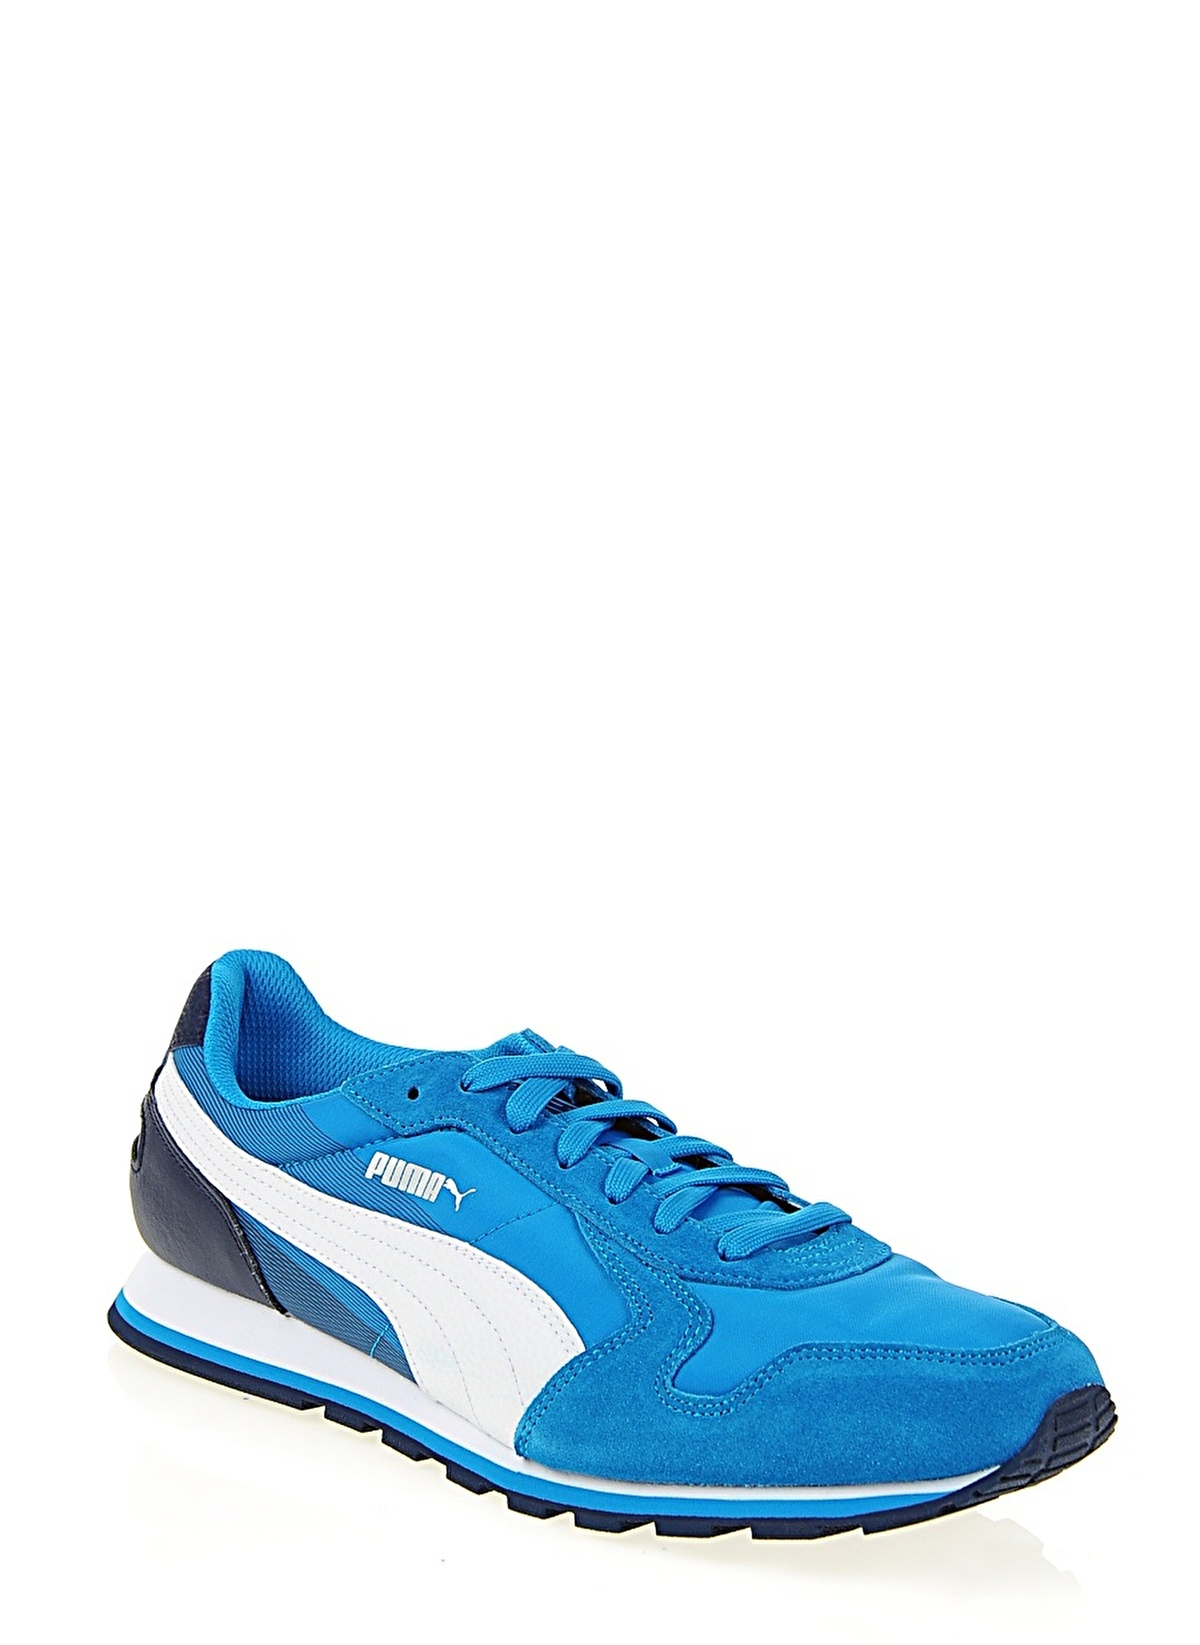 Trastorno fútbol americano princesa  Puma Unisex St Runner Nl Geometry Blue Jewel-Peacoat   Morhipo   16431174